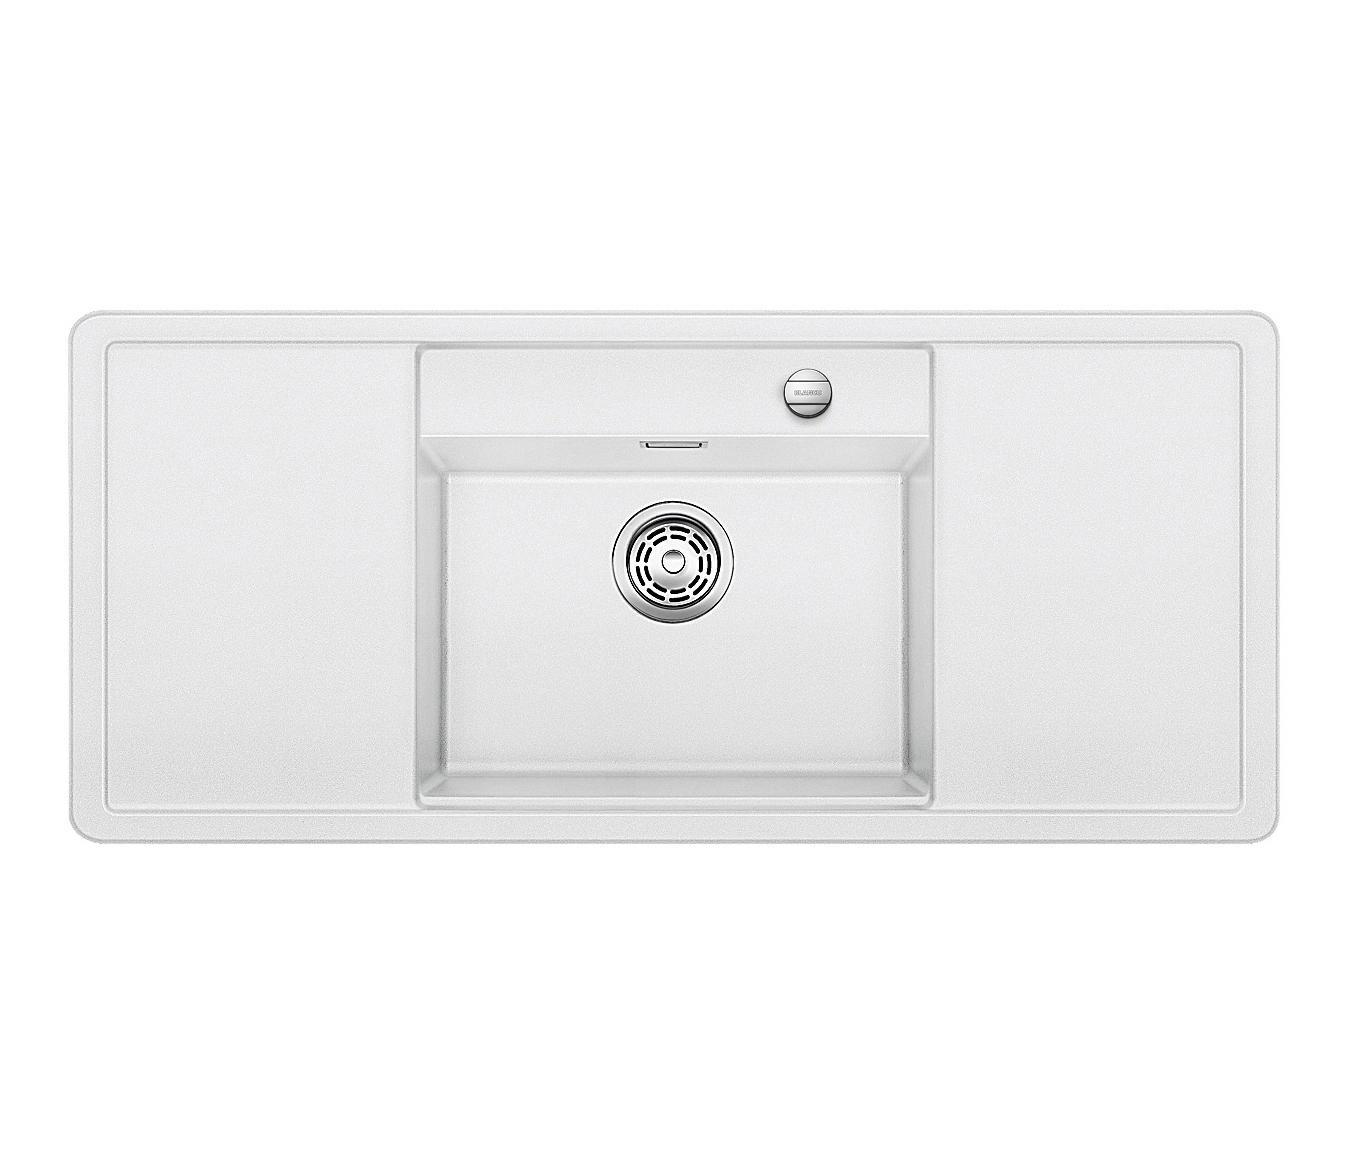 blanco alaros 6 s silgranit white kitchen sinks from. Black Bedroom Furniture Sets. Home Design Ideas